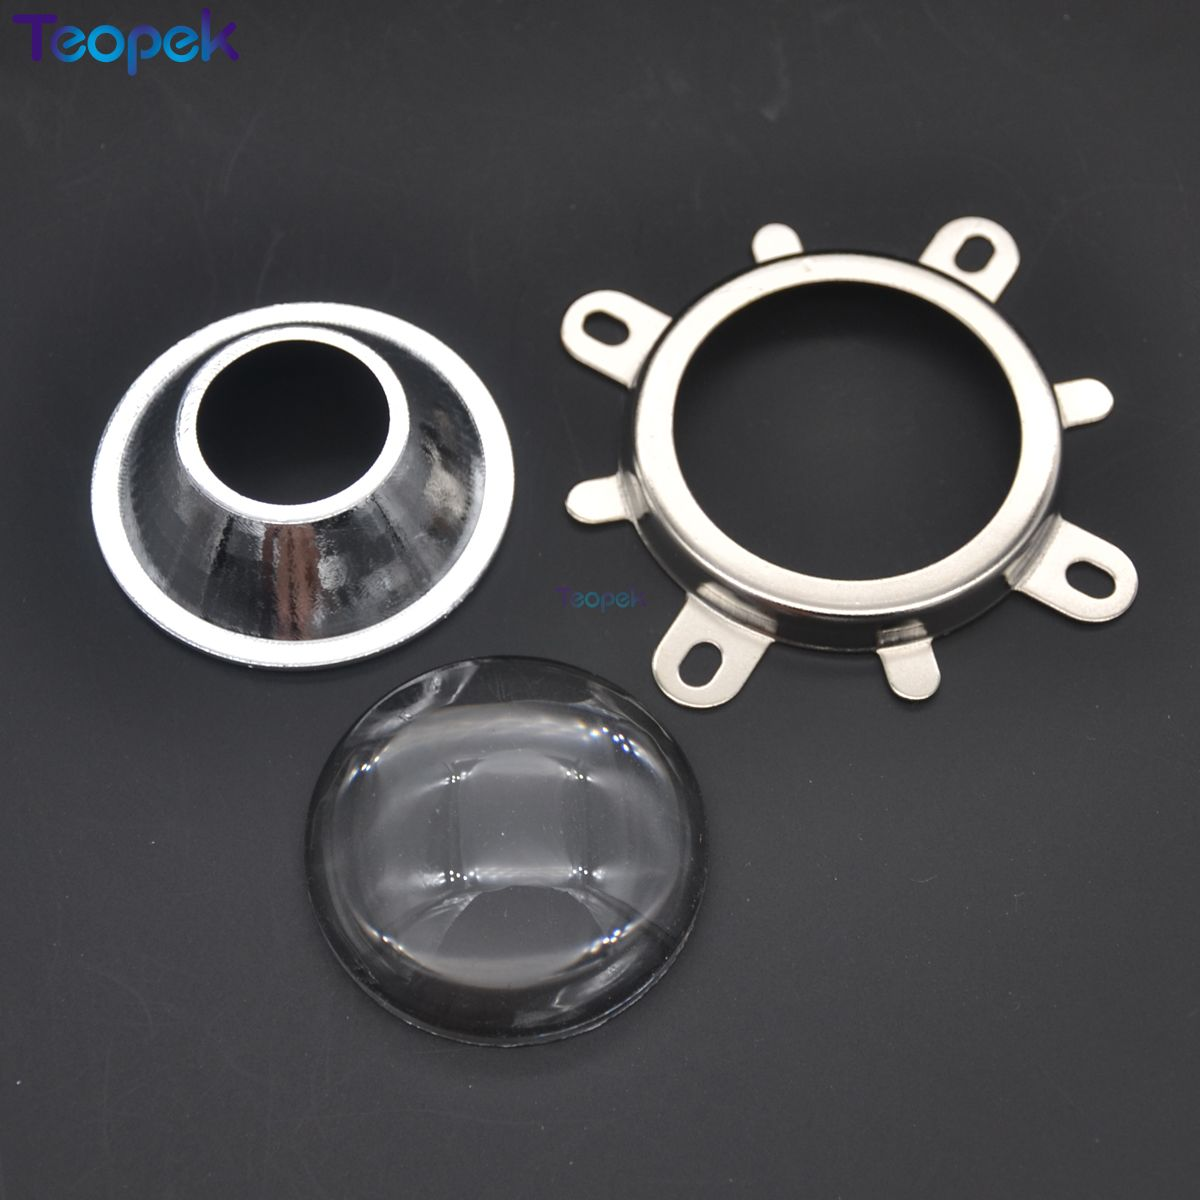 44mm LED Lens Set 60 Or 120 Degree Lens + Round Hole Reflector Collimator + Fixied Bracket 3 In 1 Kit For COB LEDs